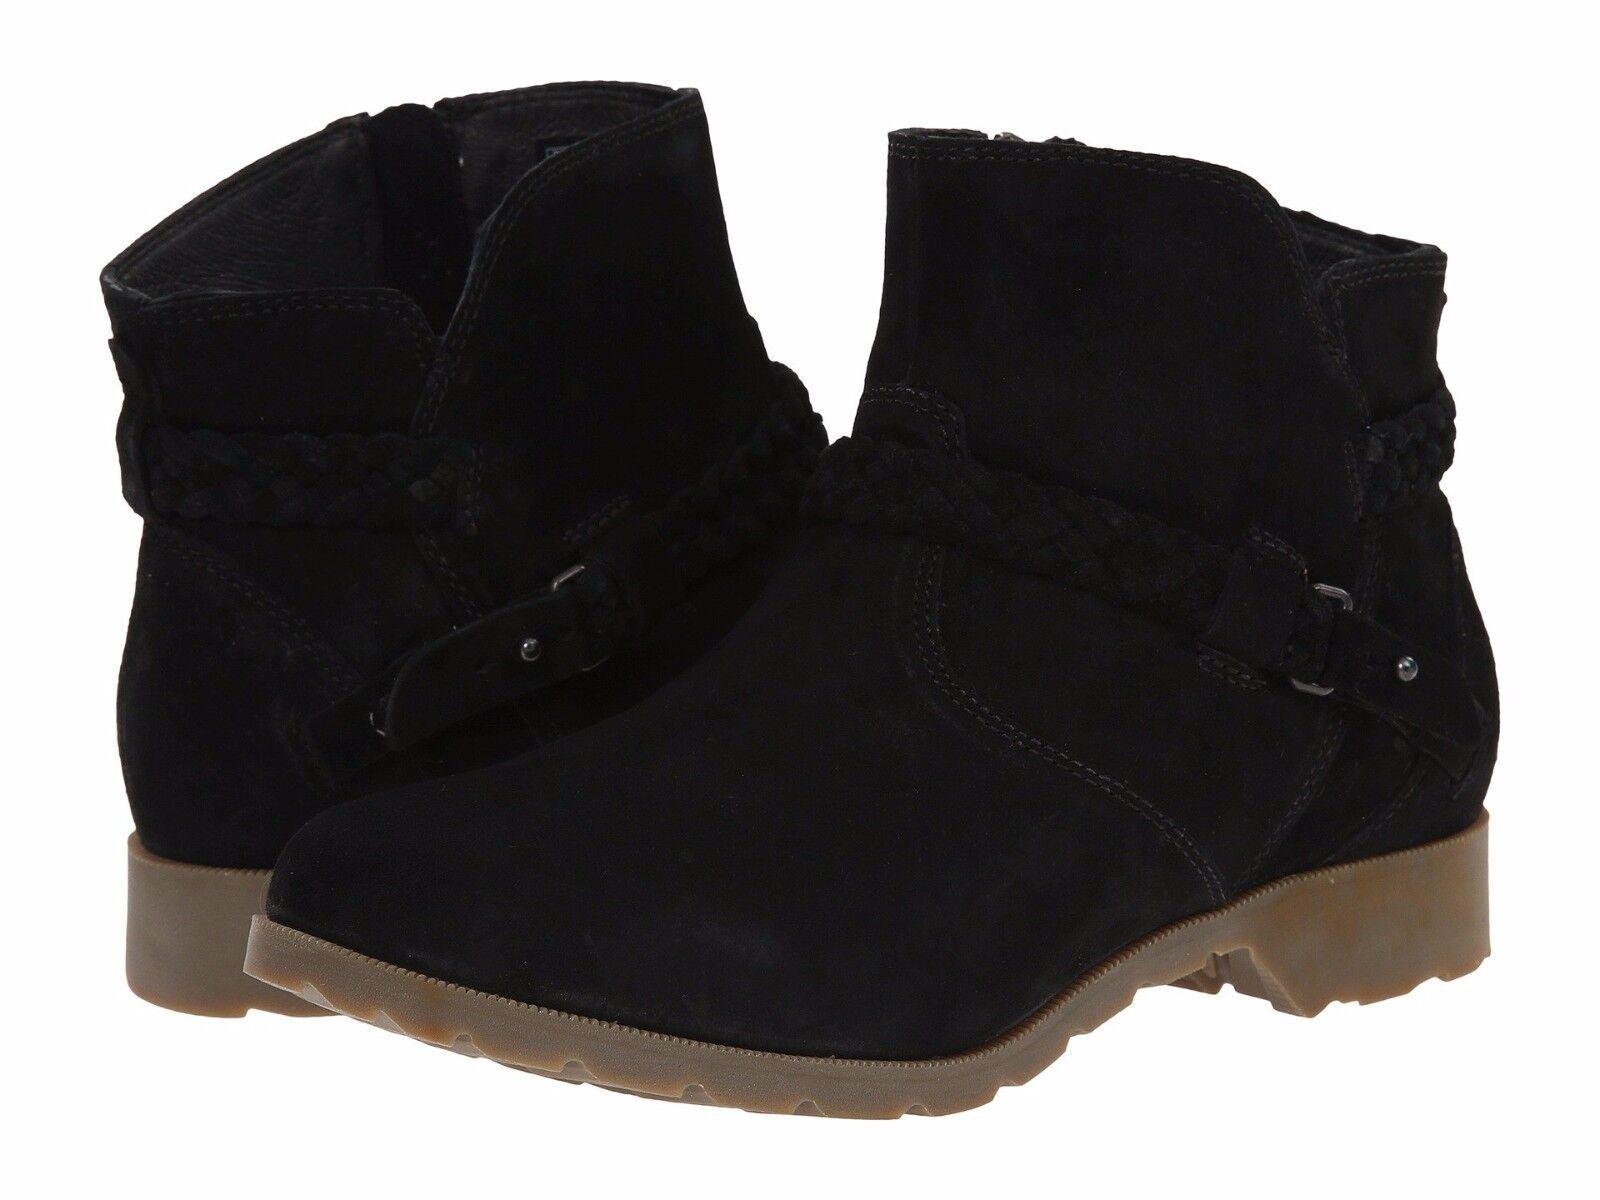 New 0 TEVA 'DeLaVina' Ankle Boots, Braided Belt, sz 6